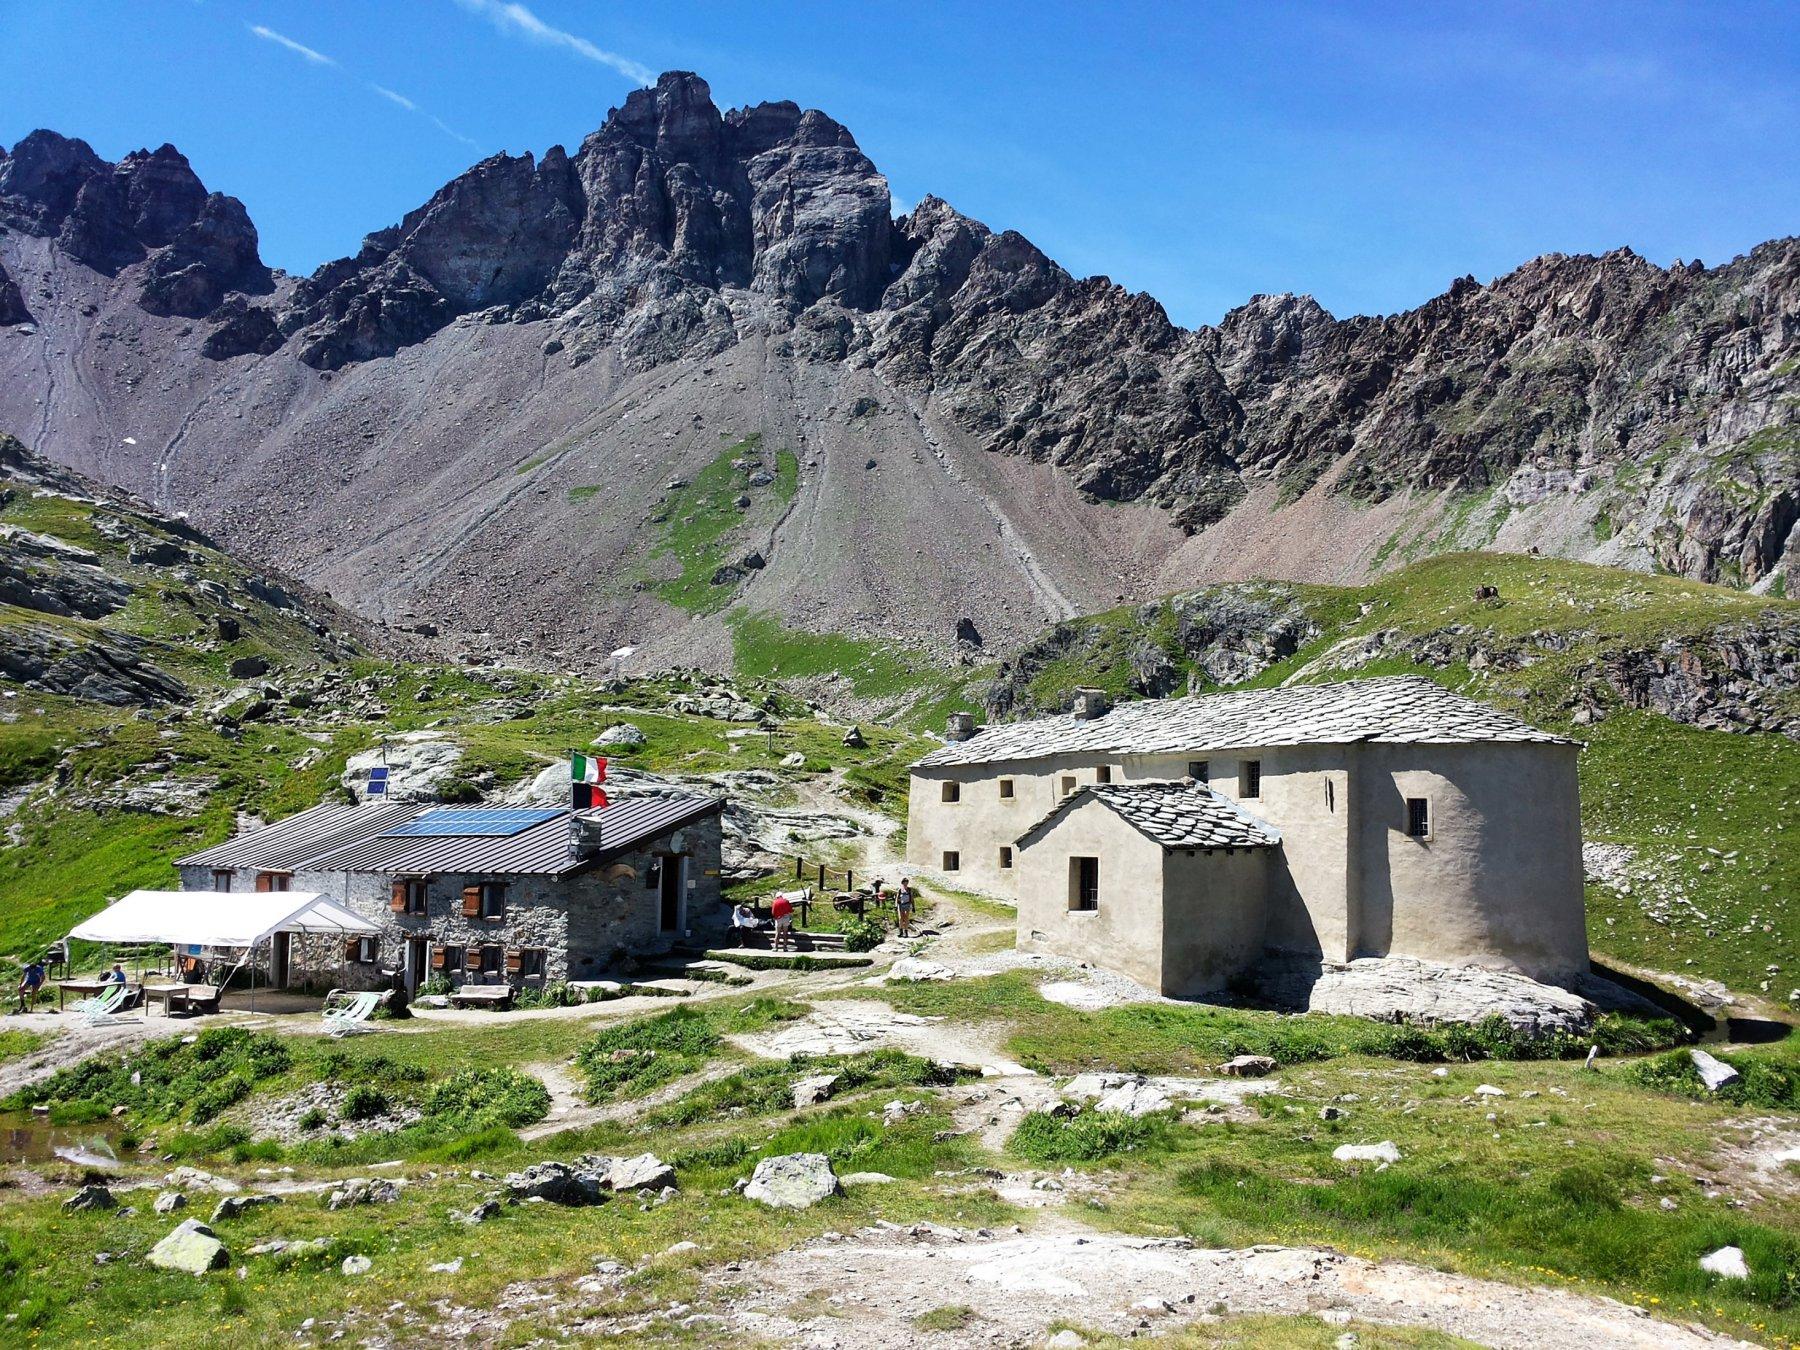 Cuney (Oratorio) da Lignan 2016-08-06